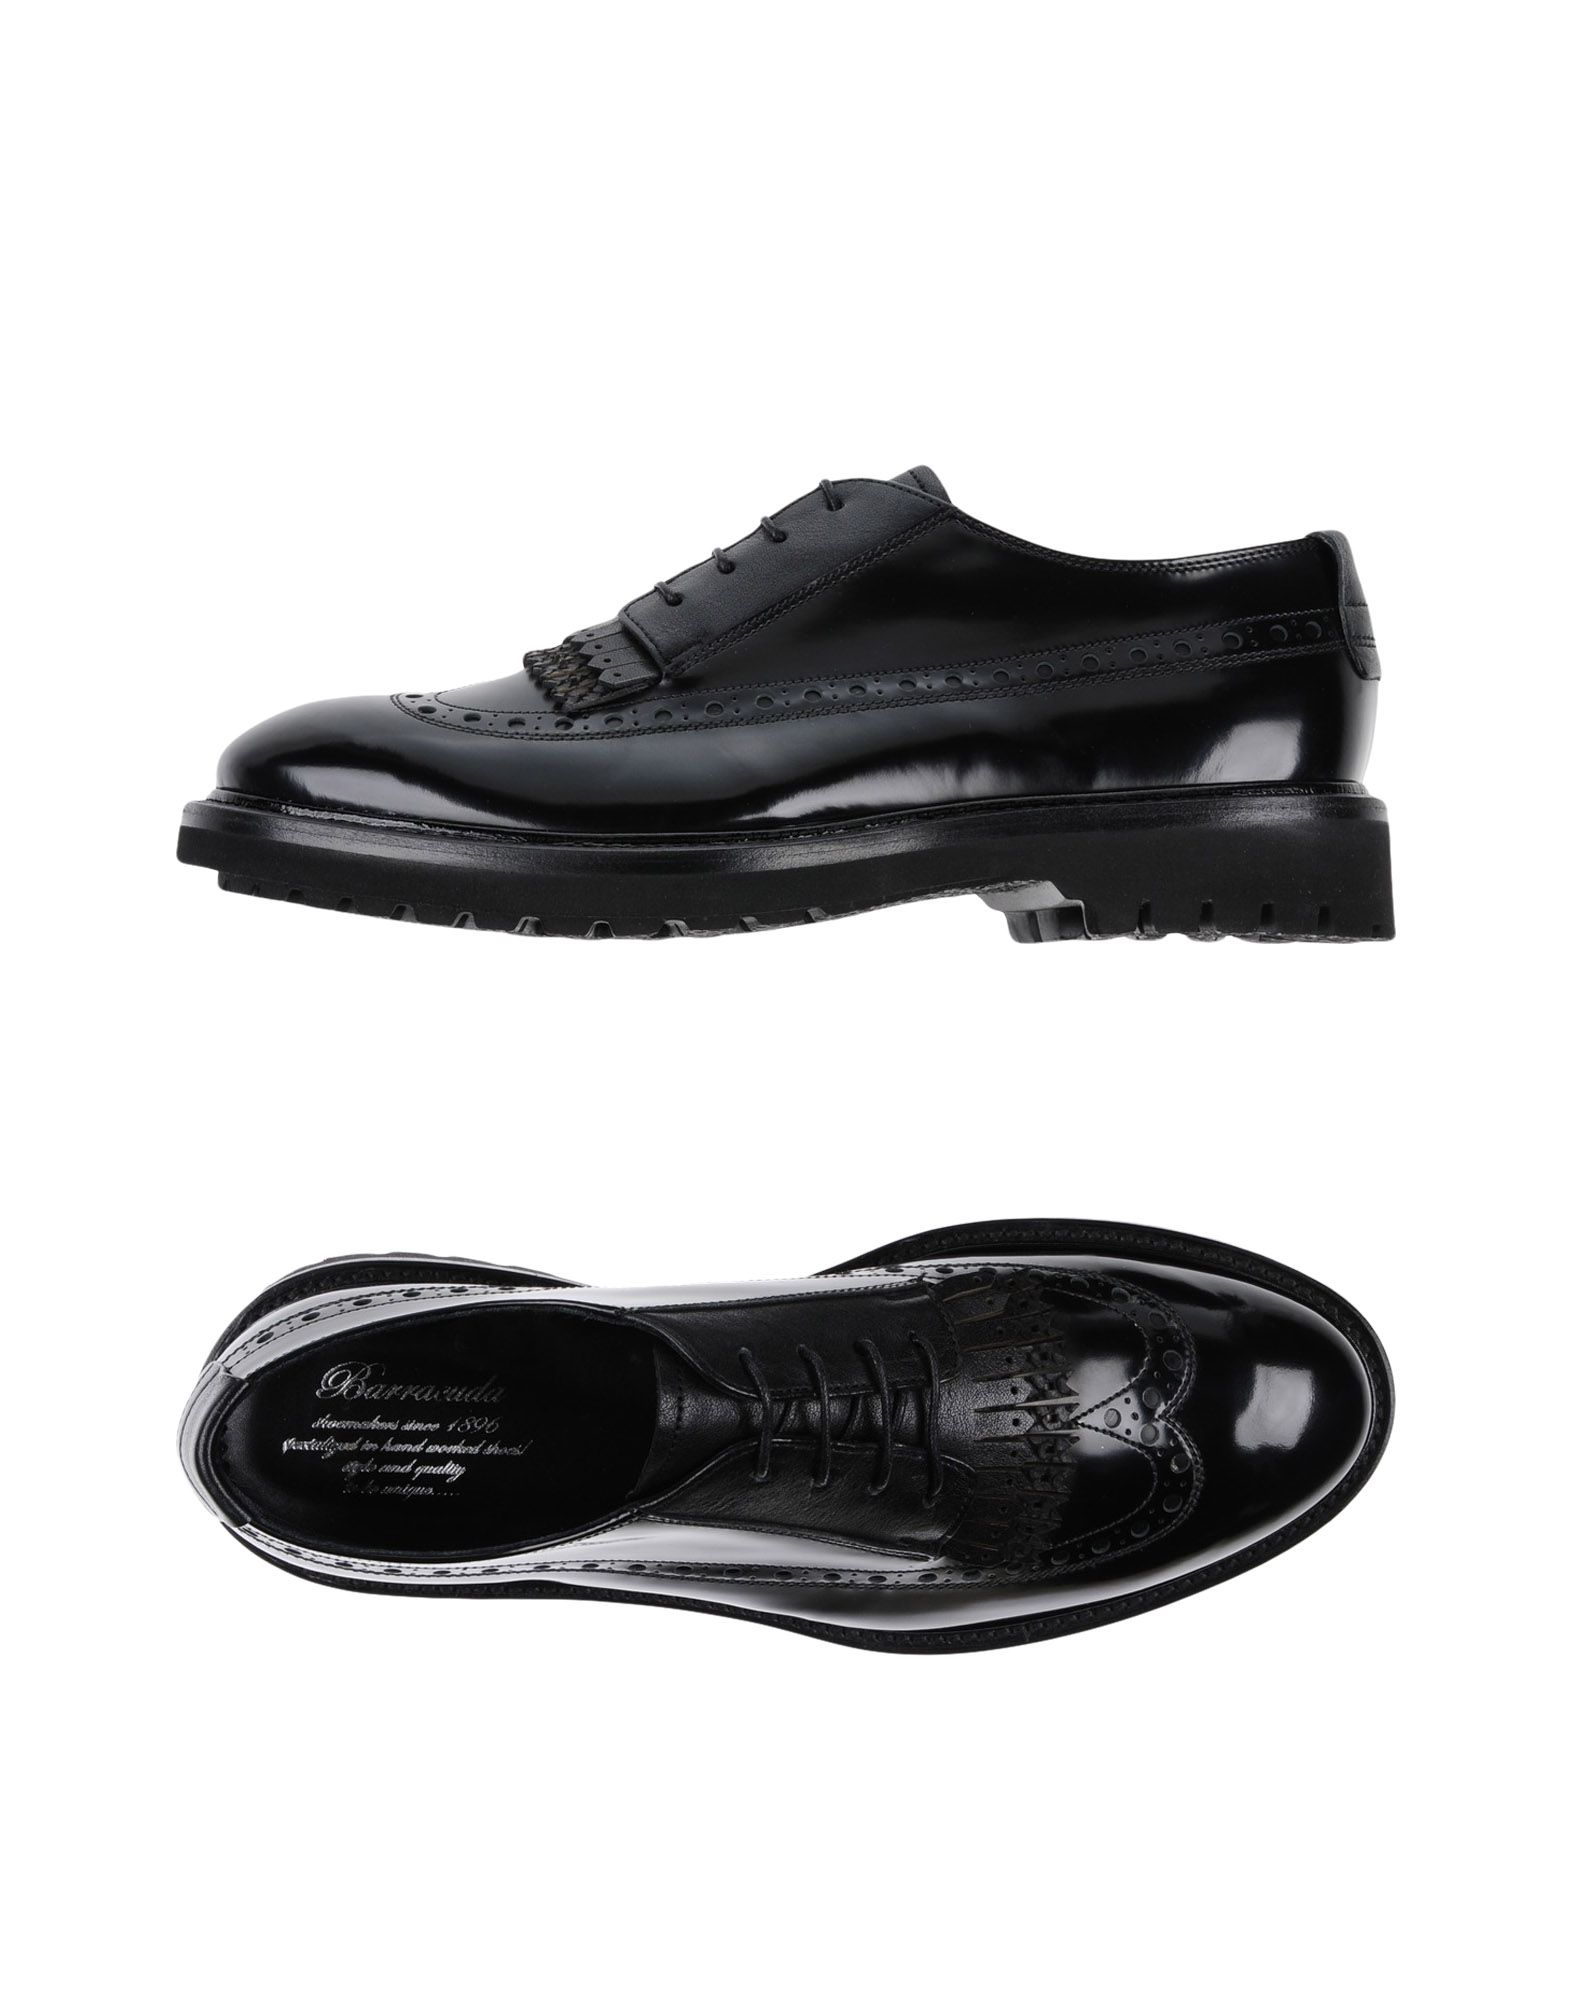 BARRACUDA Обувь на шнурках первый внутри обувь обувь обувь обувь обувь обувь обувь обувь обувь 8a2549 мужская армия green 40 метров